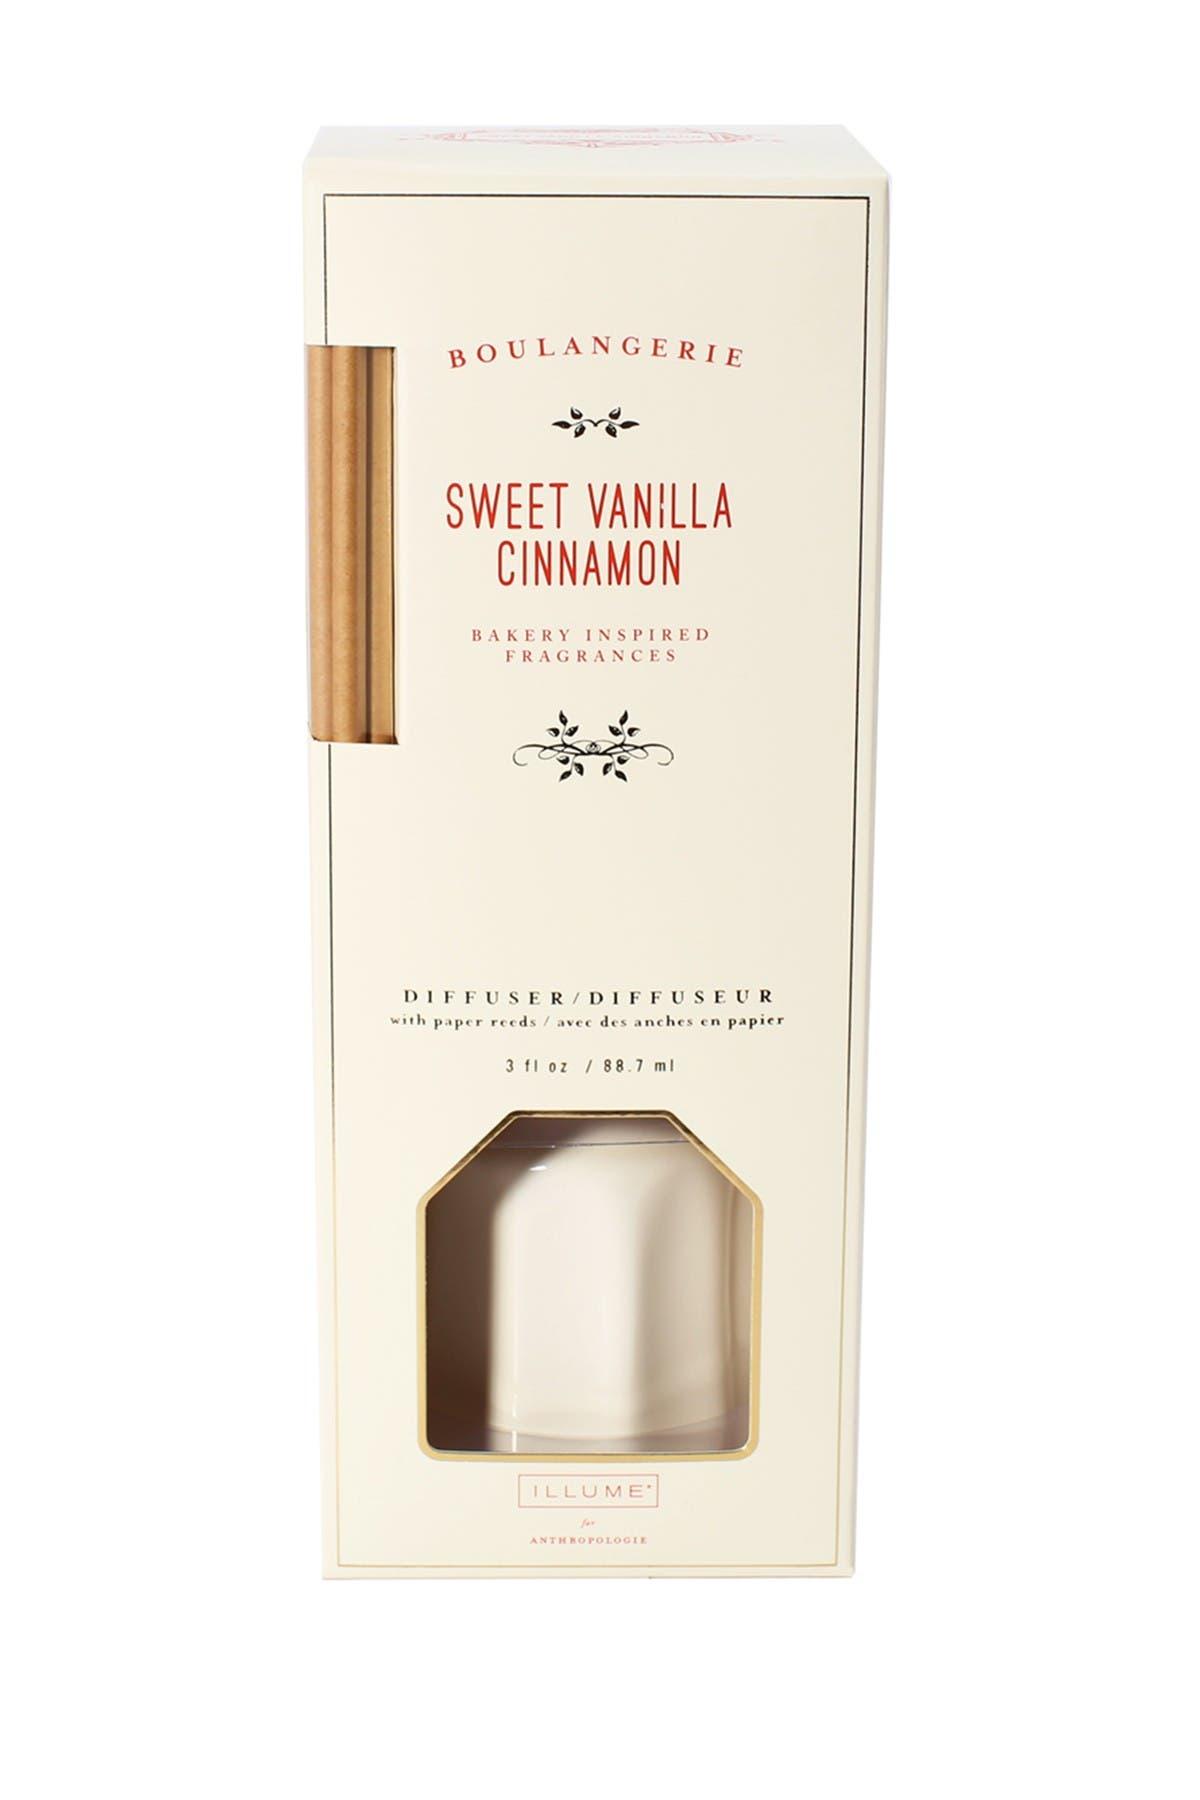 Image of ANTHROPOLOGIE Sweet Vanilla Cinnamon Boulangerie Diffuser